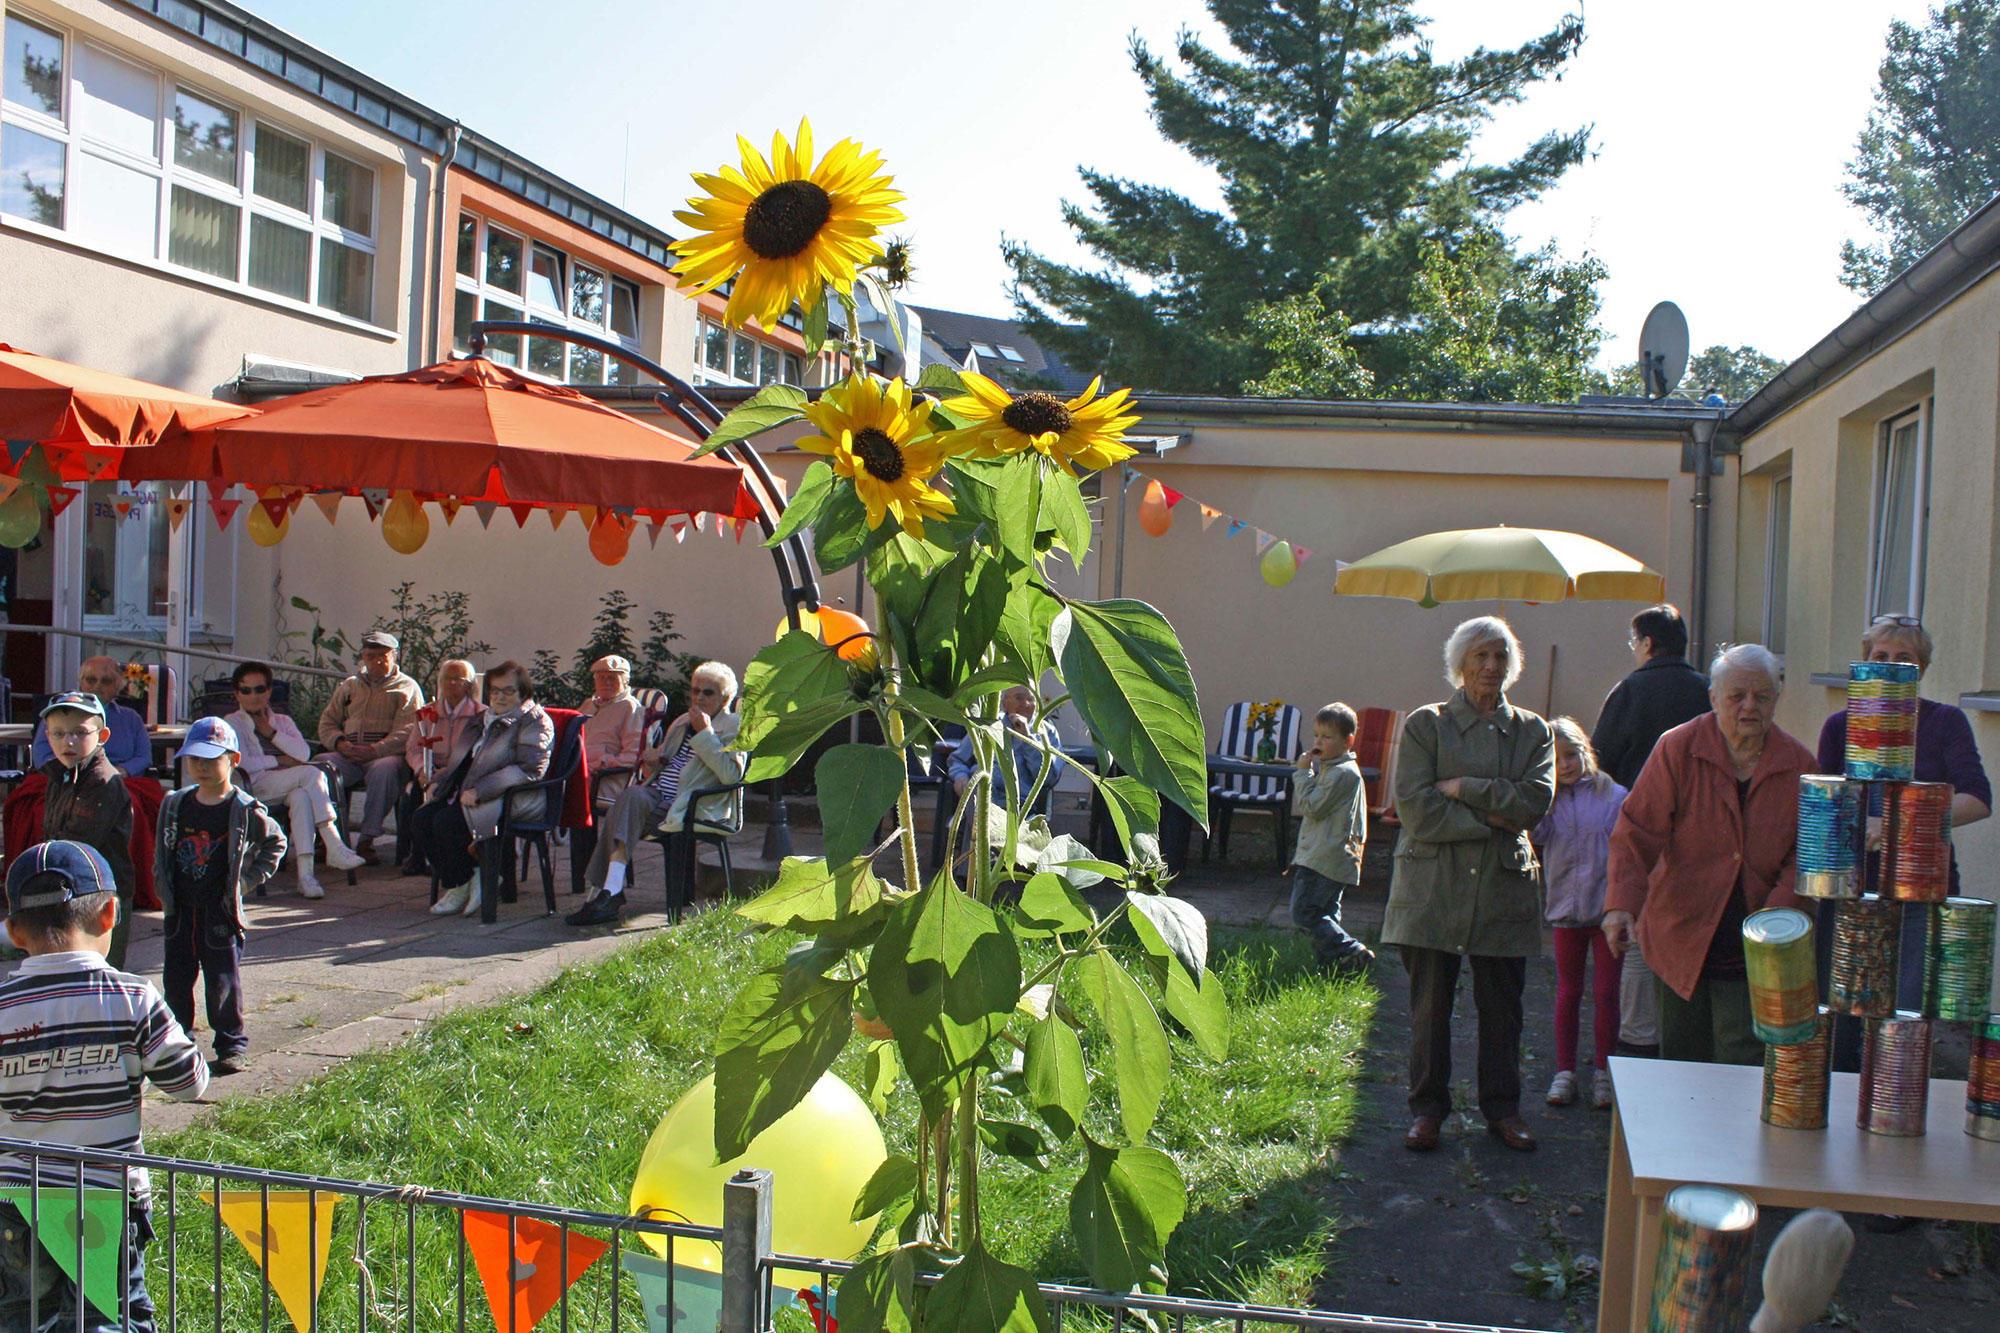 ASB Tagespflegeeinrichtung Königs Wusterhausen